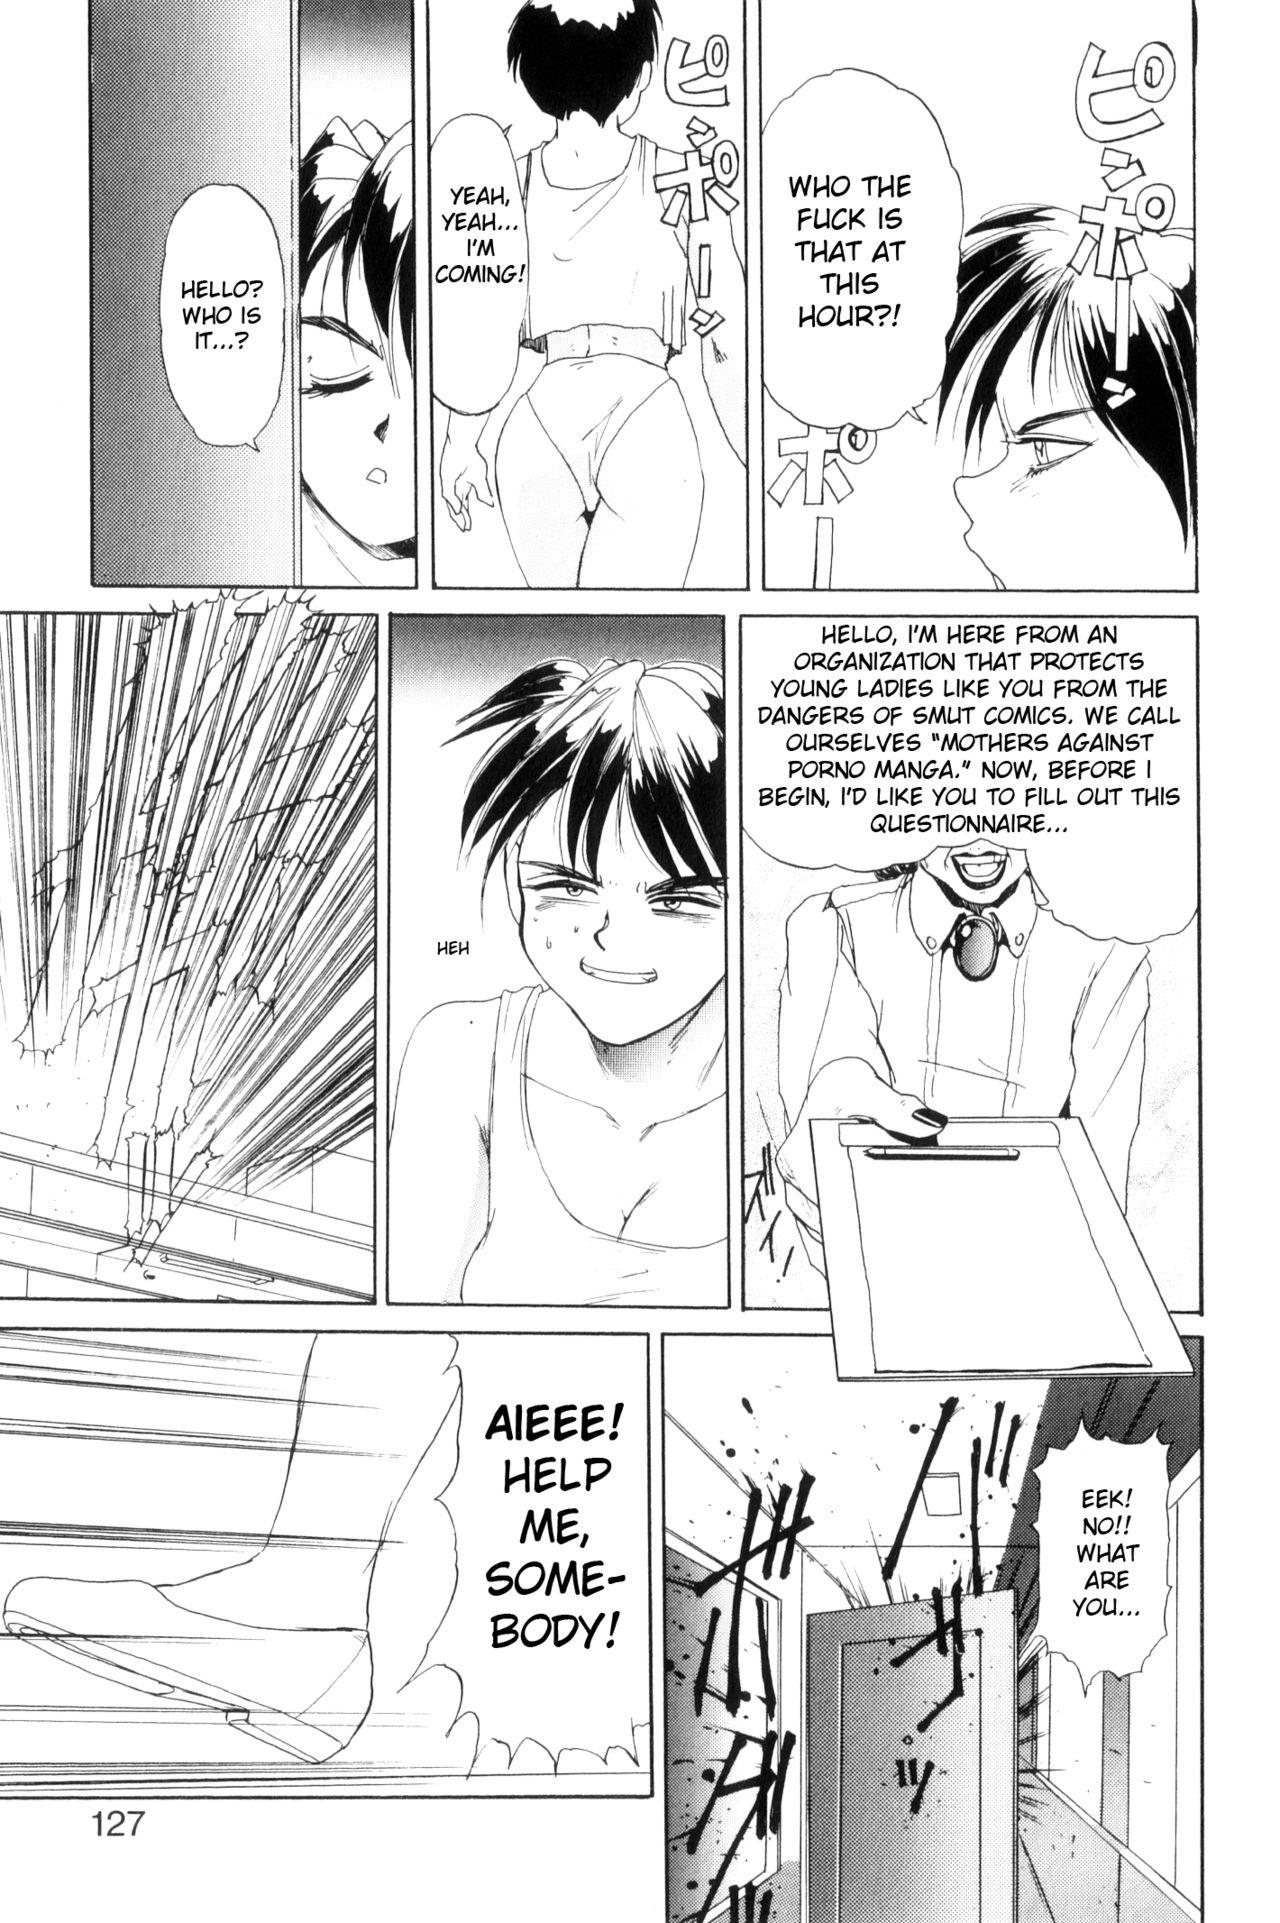 [NeWMeN] Secret Plot [Shinsouban] Ch. 1-6 [English] 133